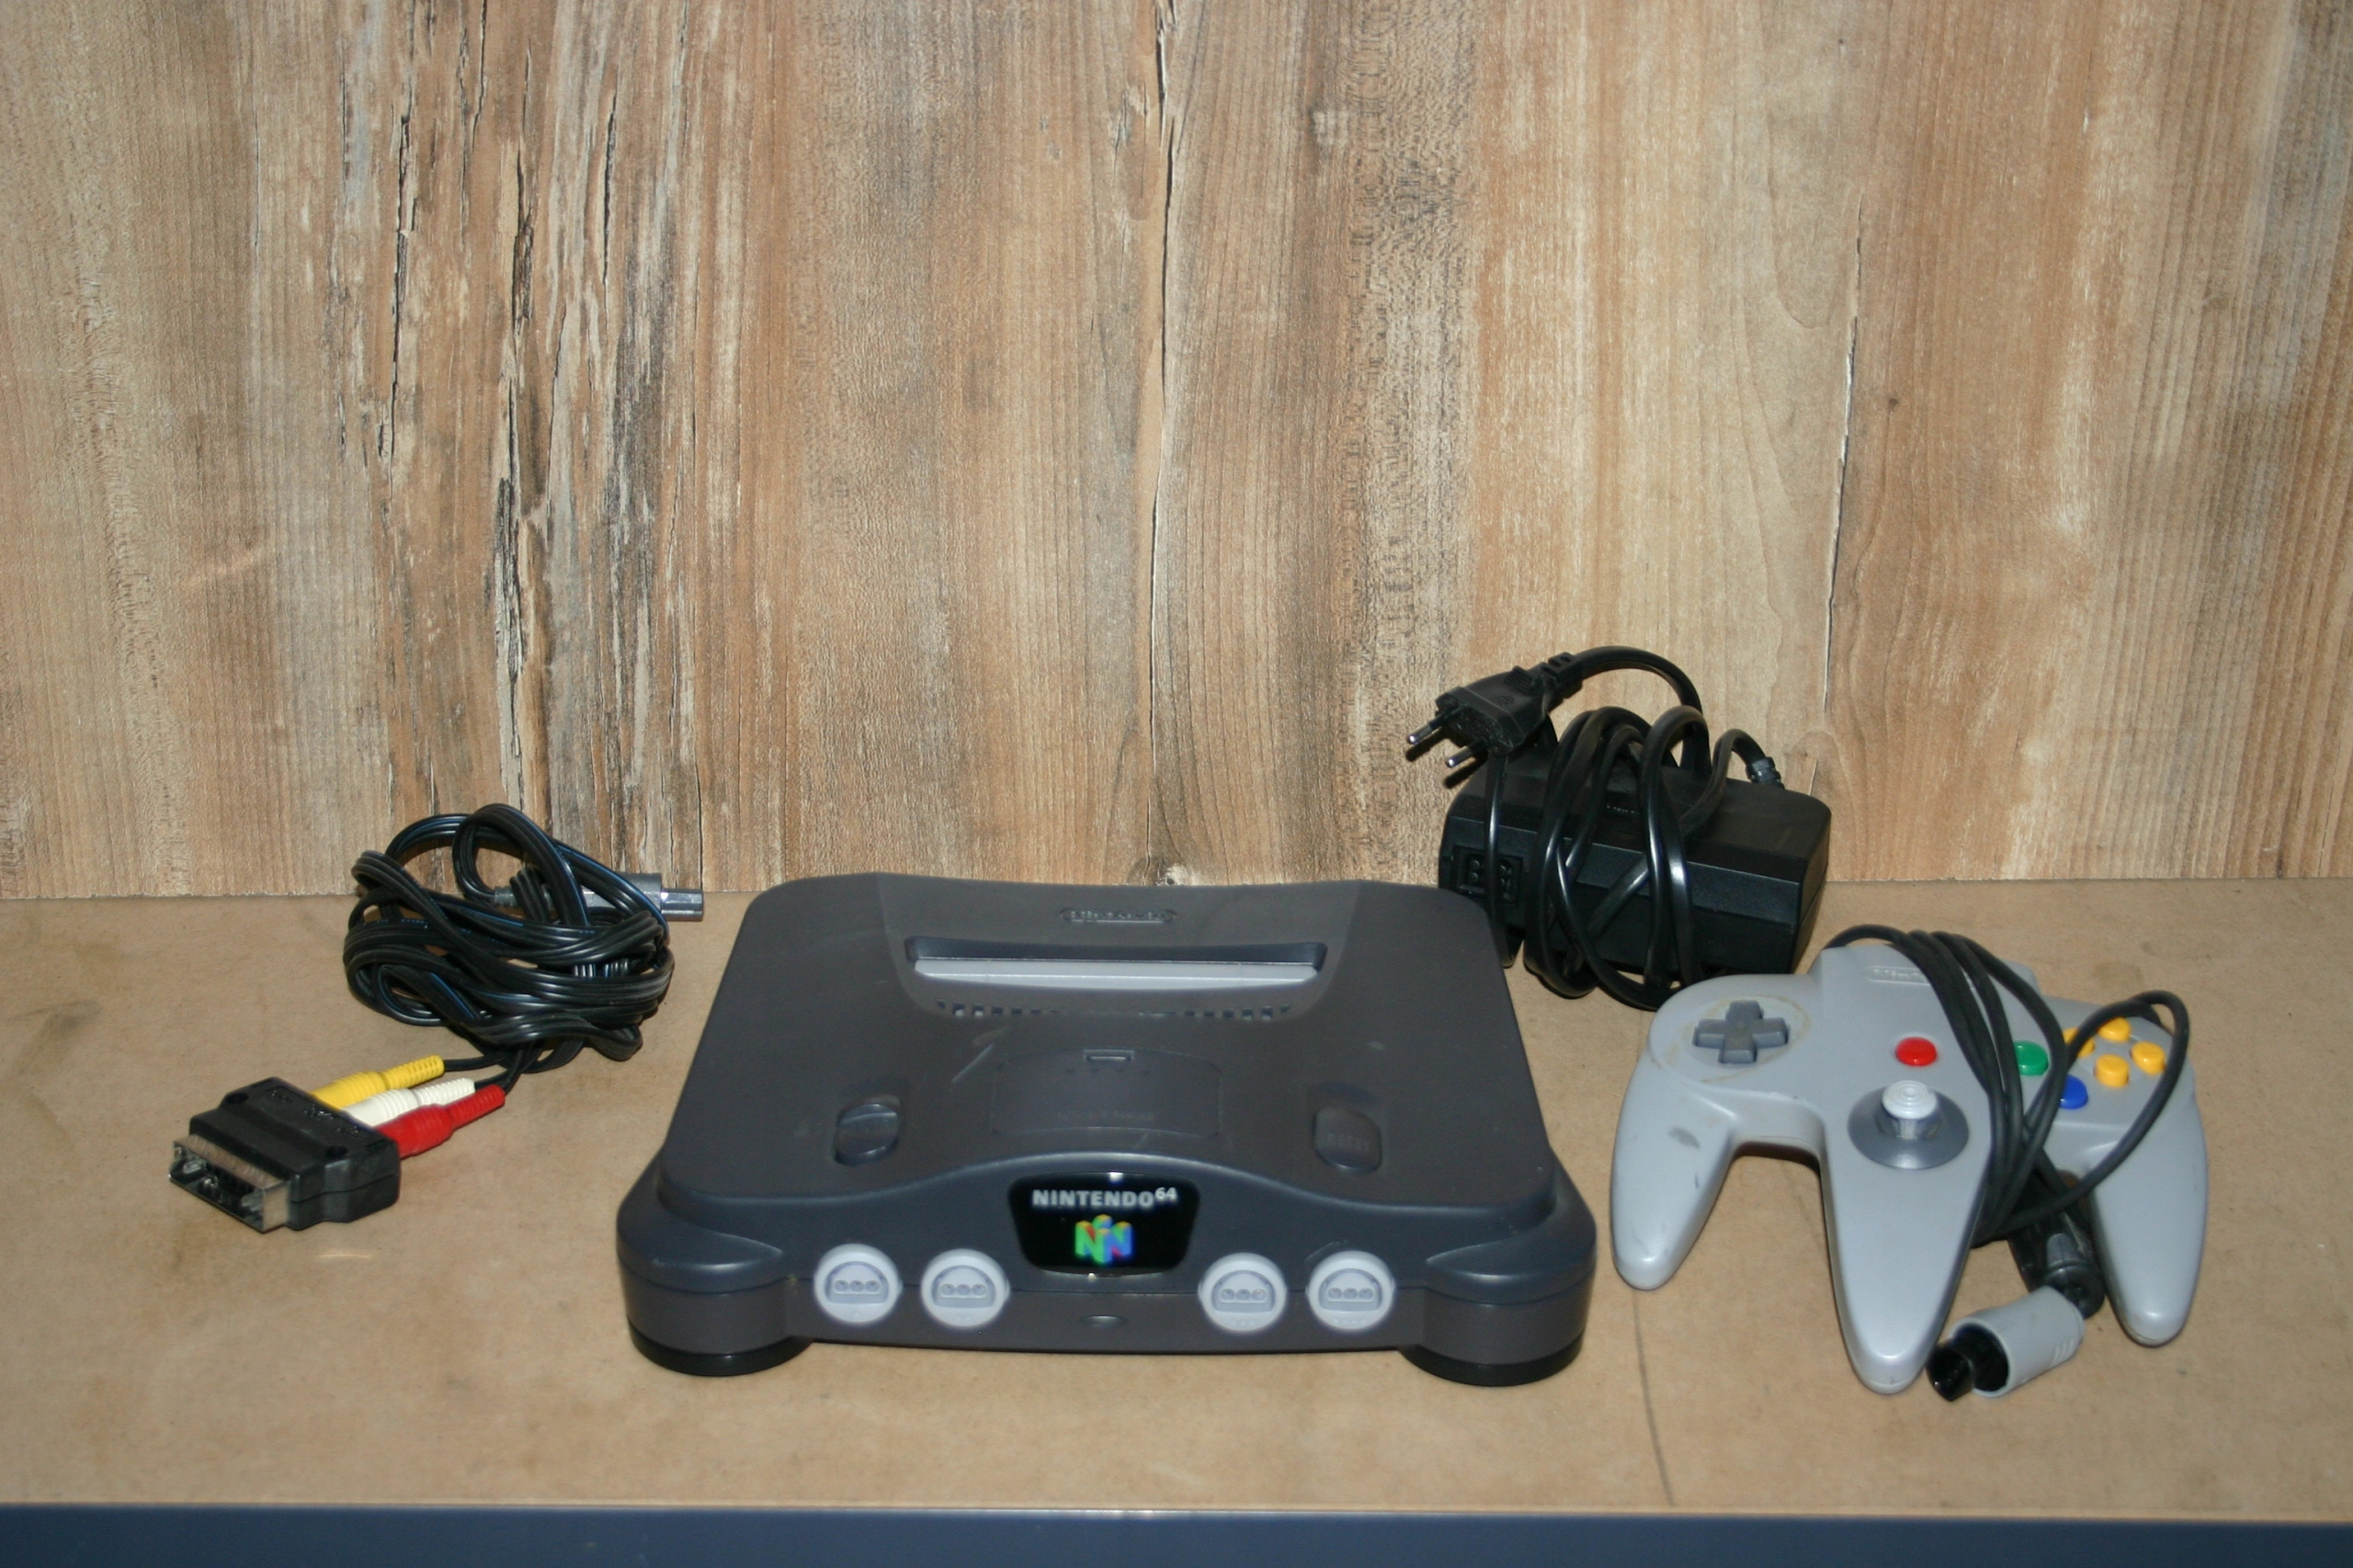 Nintendo 64 + pad